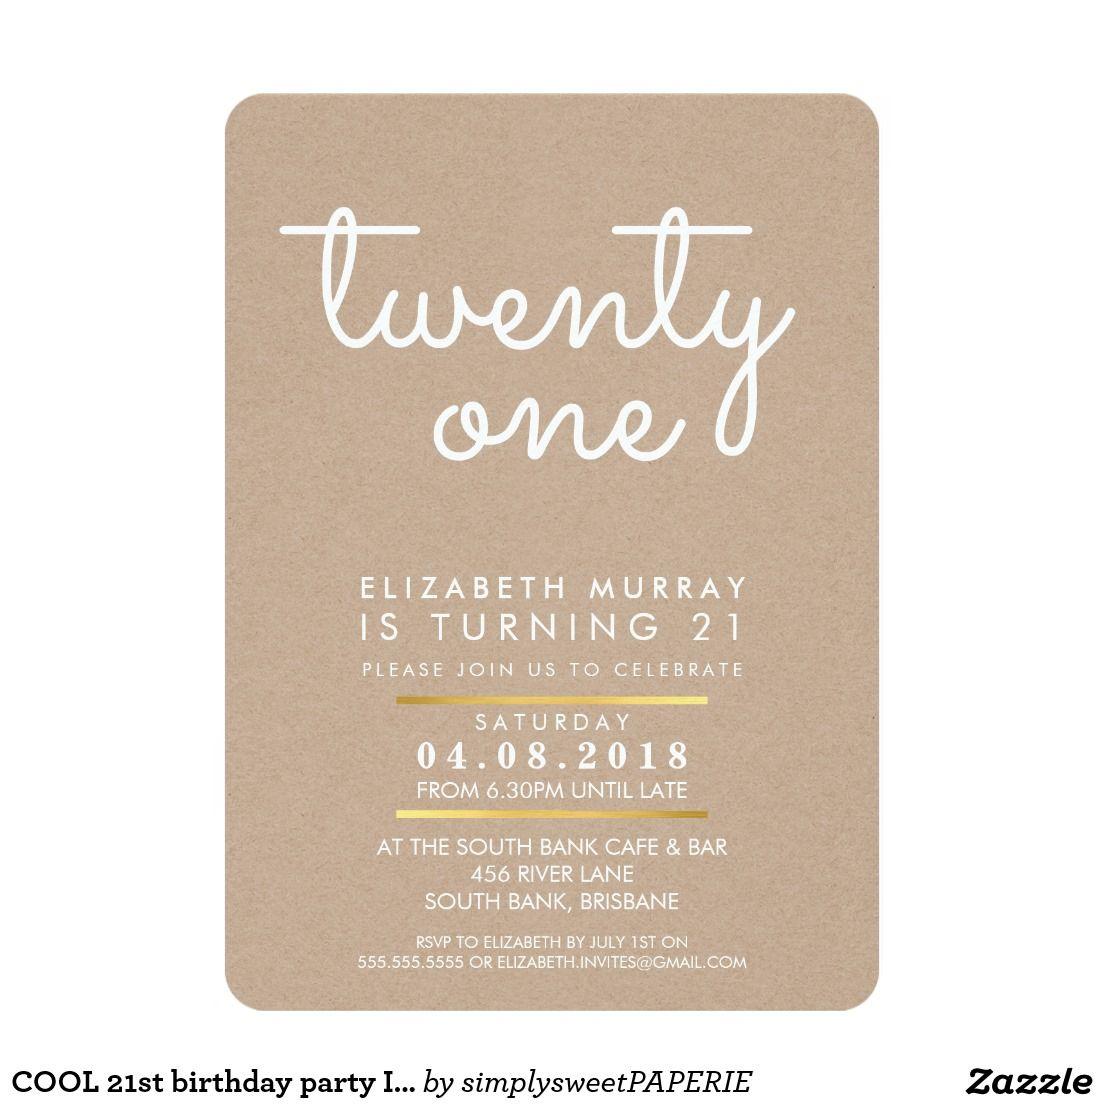 COOL 21st birthday party INVITE rustic kraft white